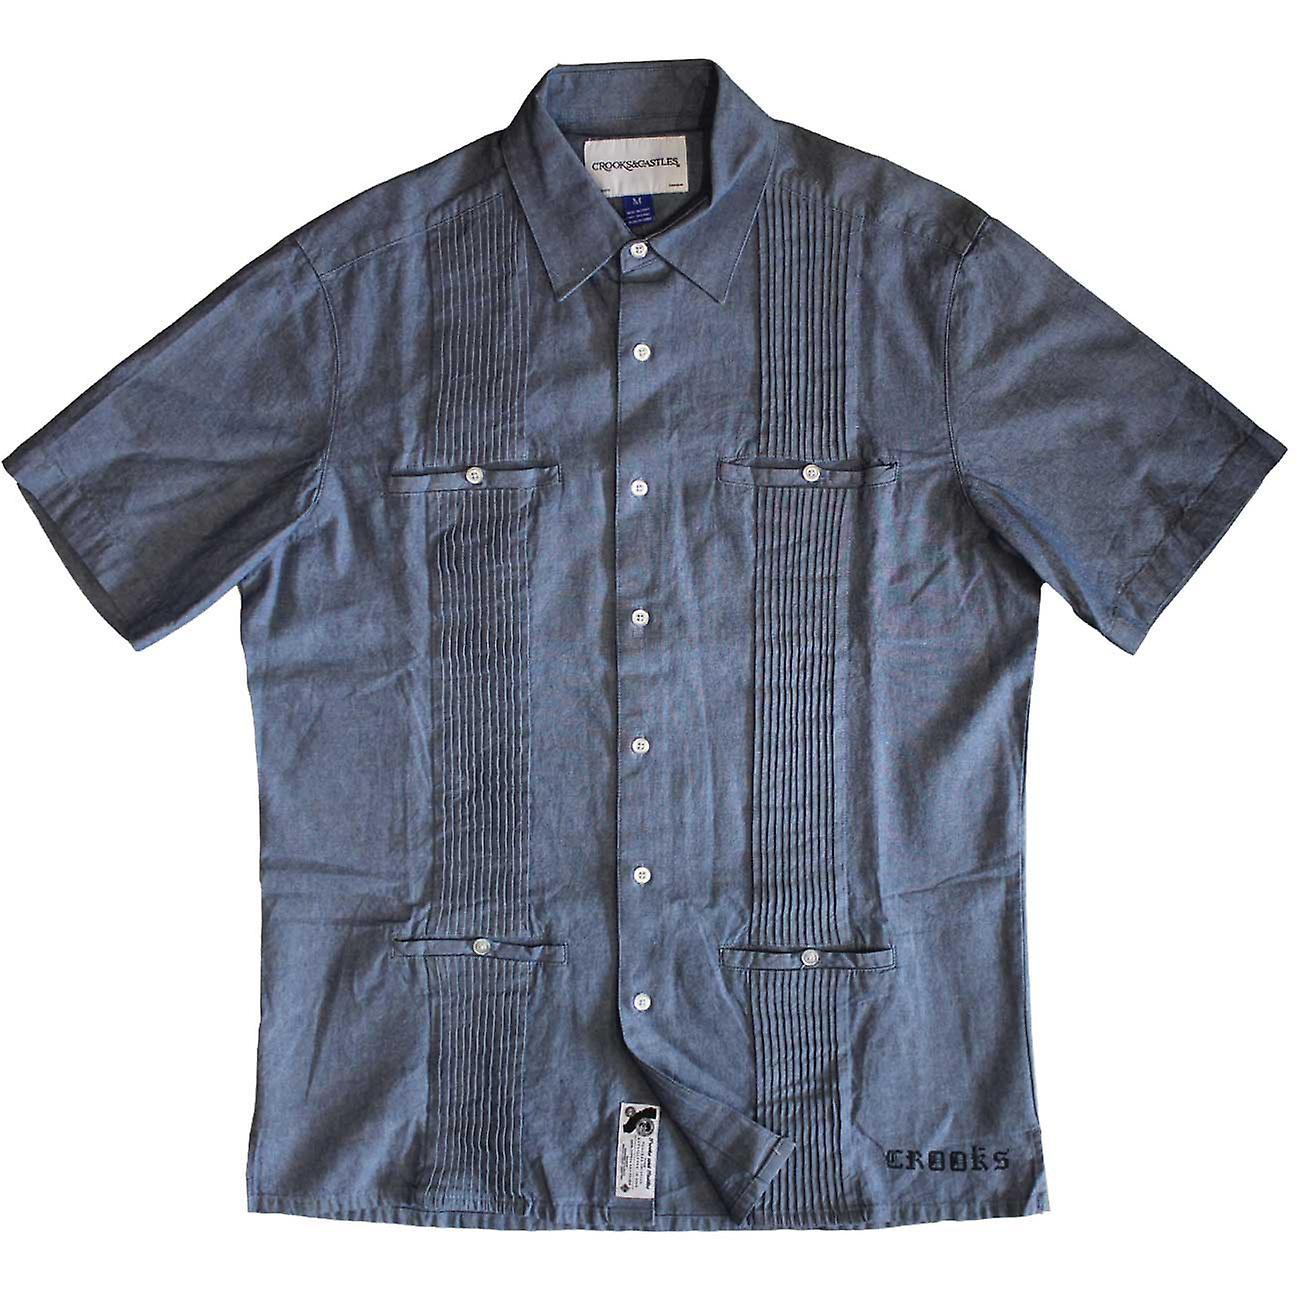 Crooks & Castles Woven Shirt Santiago Chambray